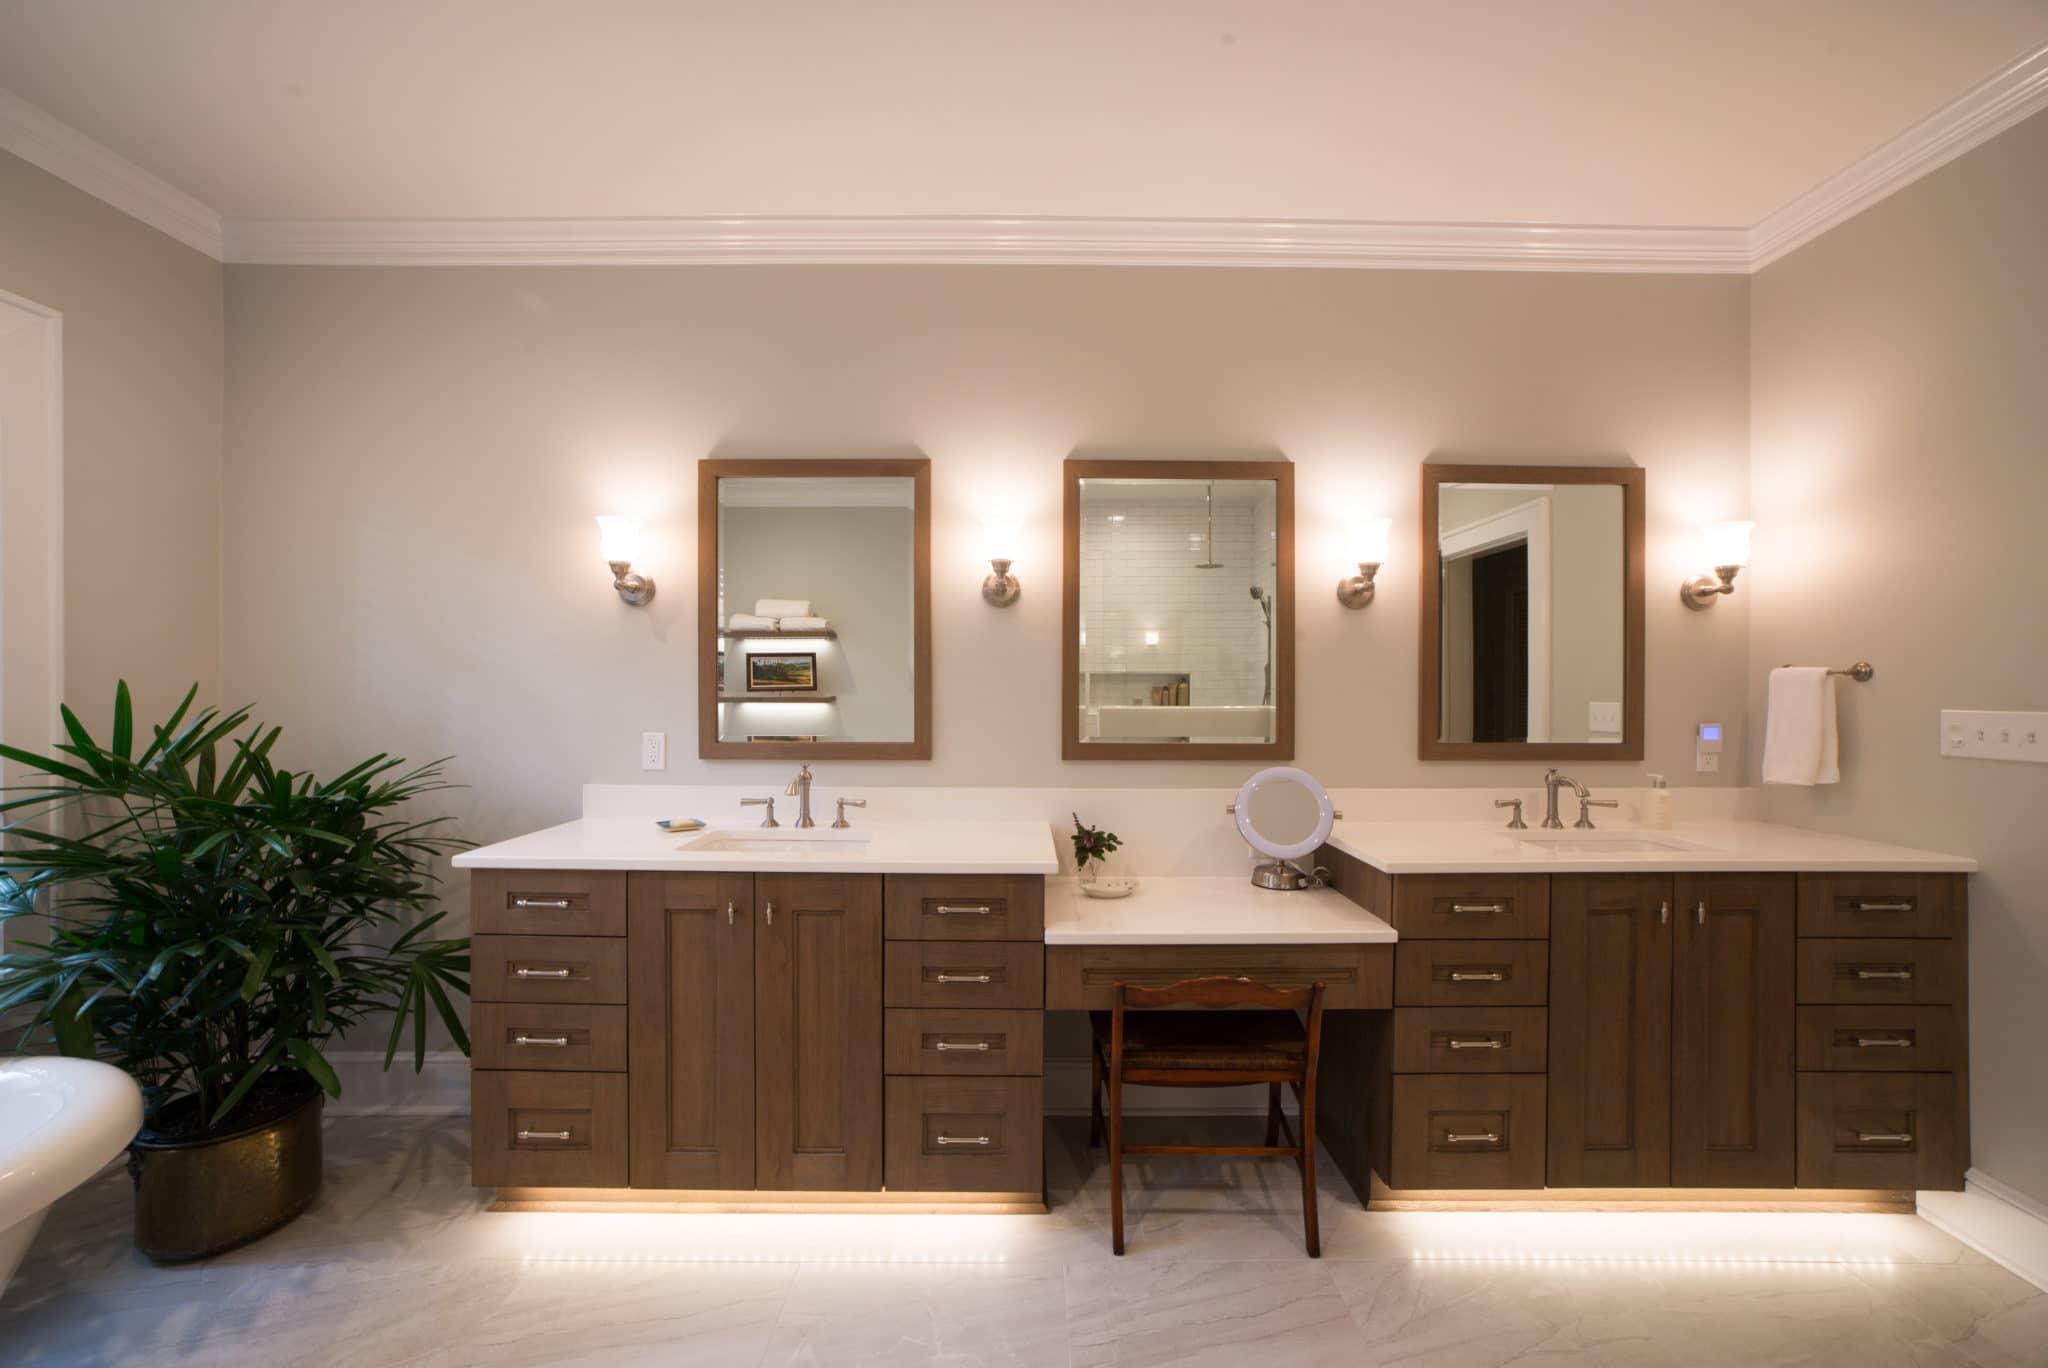 Bath Vanity Remodeling Contractor